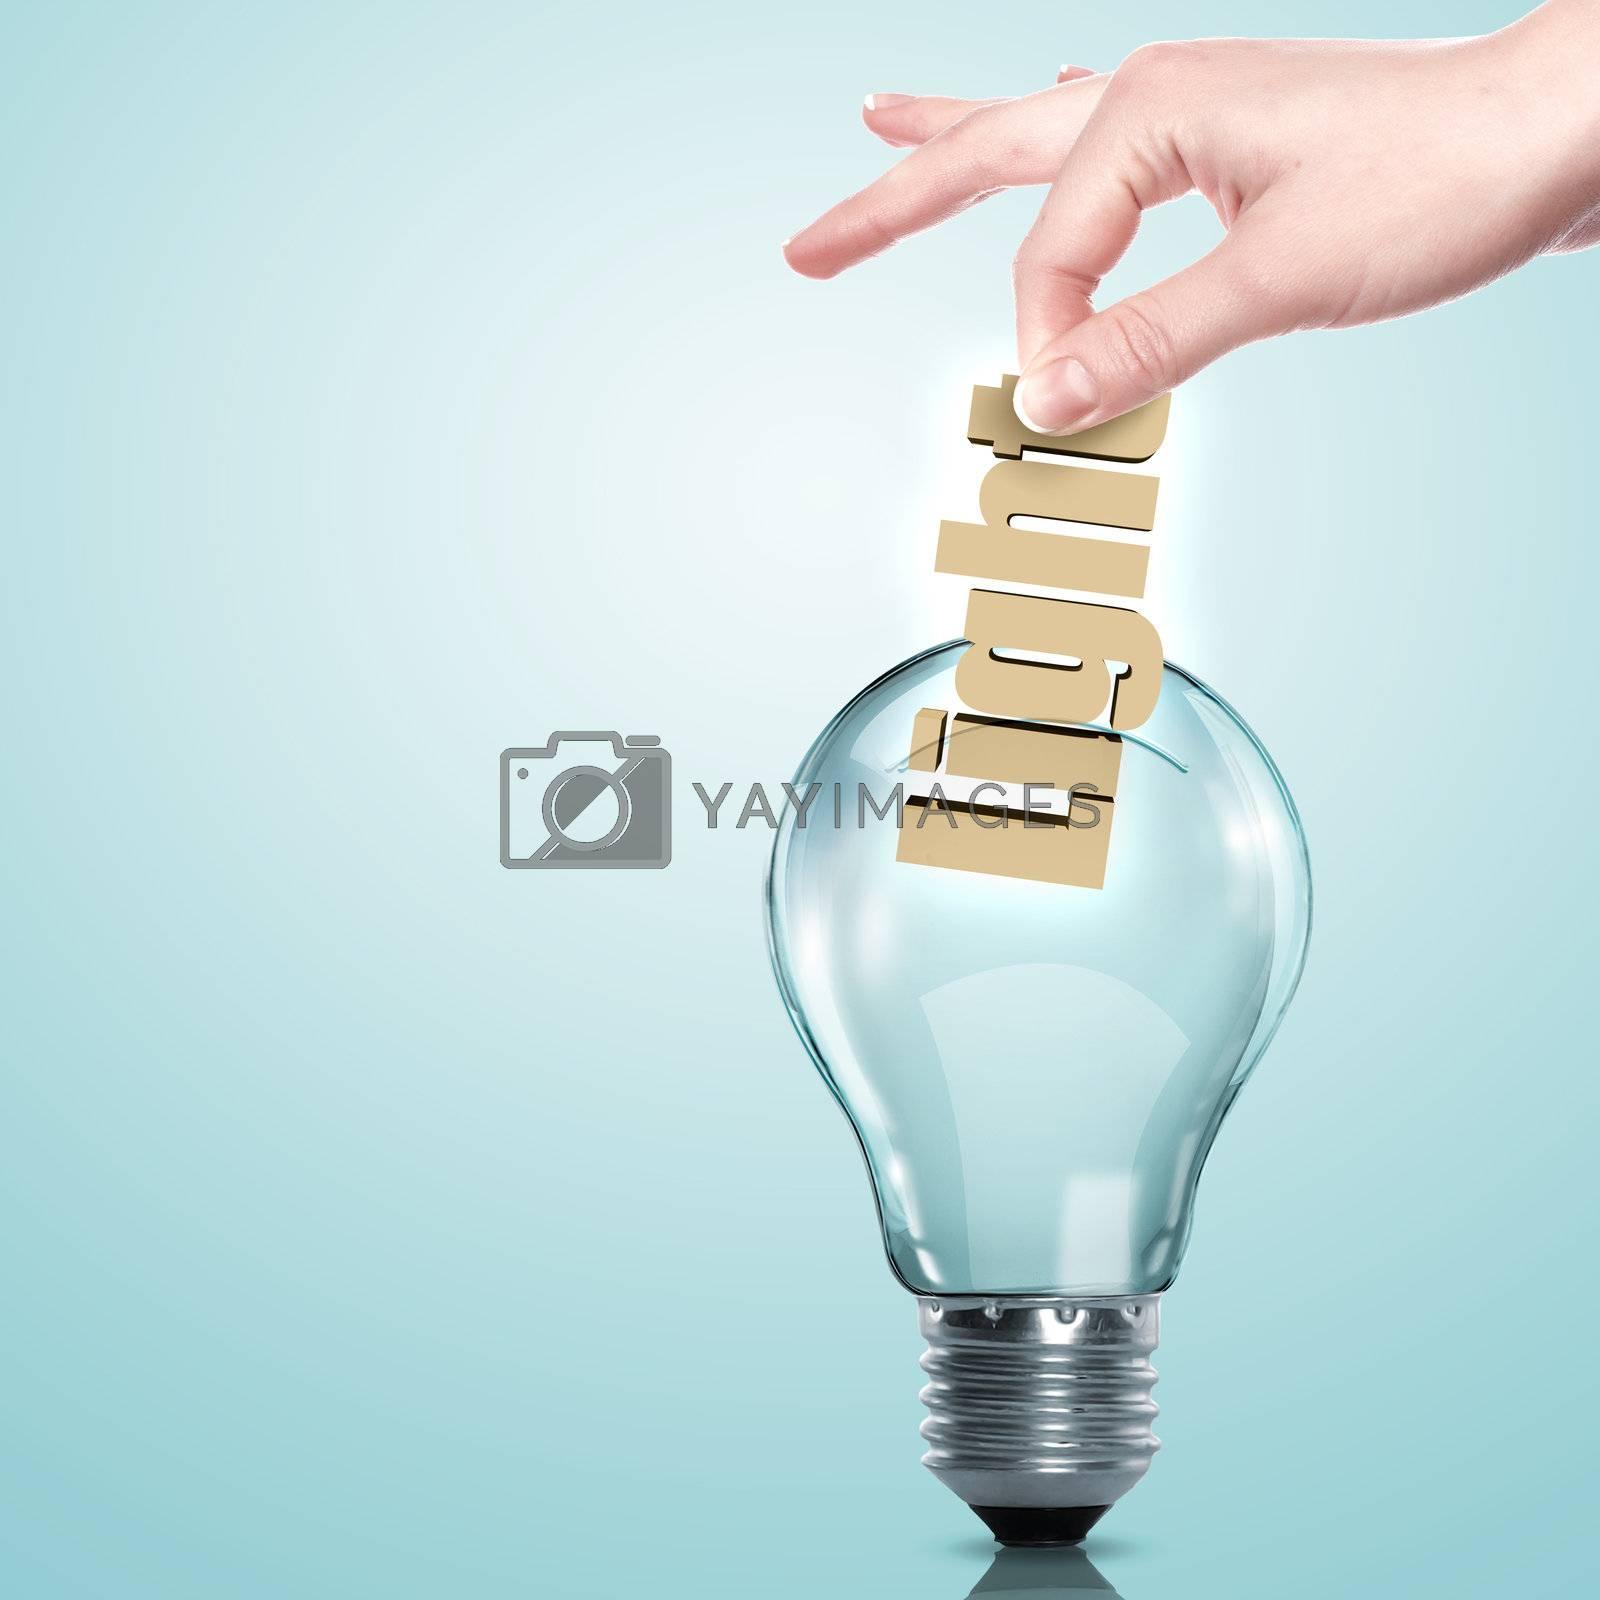 Electric bulb illustration by Sergey Nivens